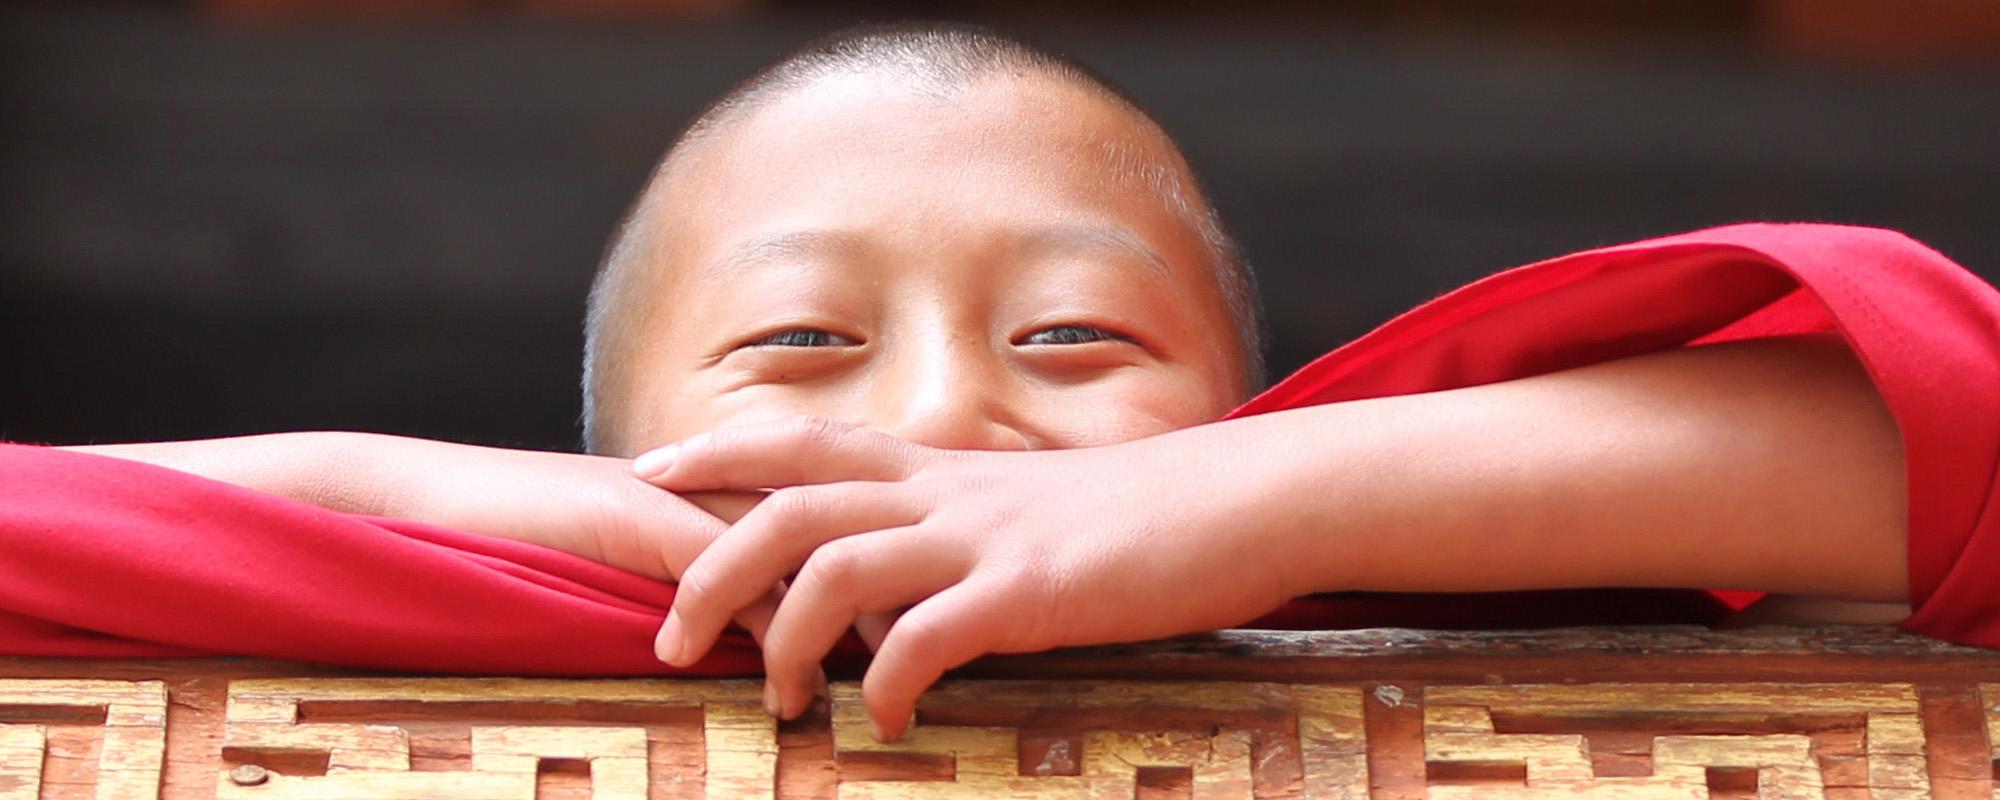 12 NIGHTS DISCOVERING BHUTAN JOURNEY